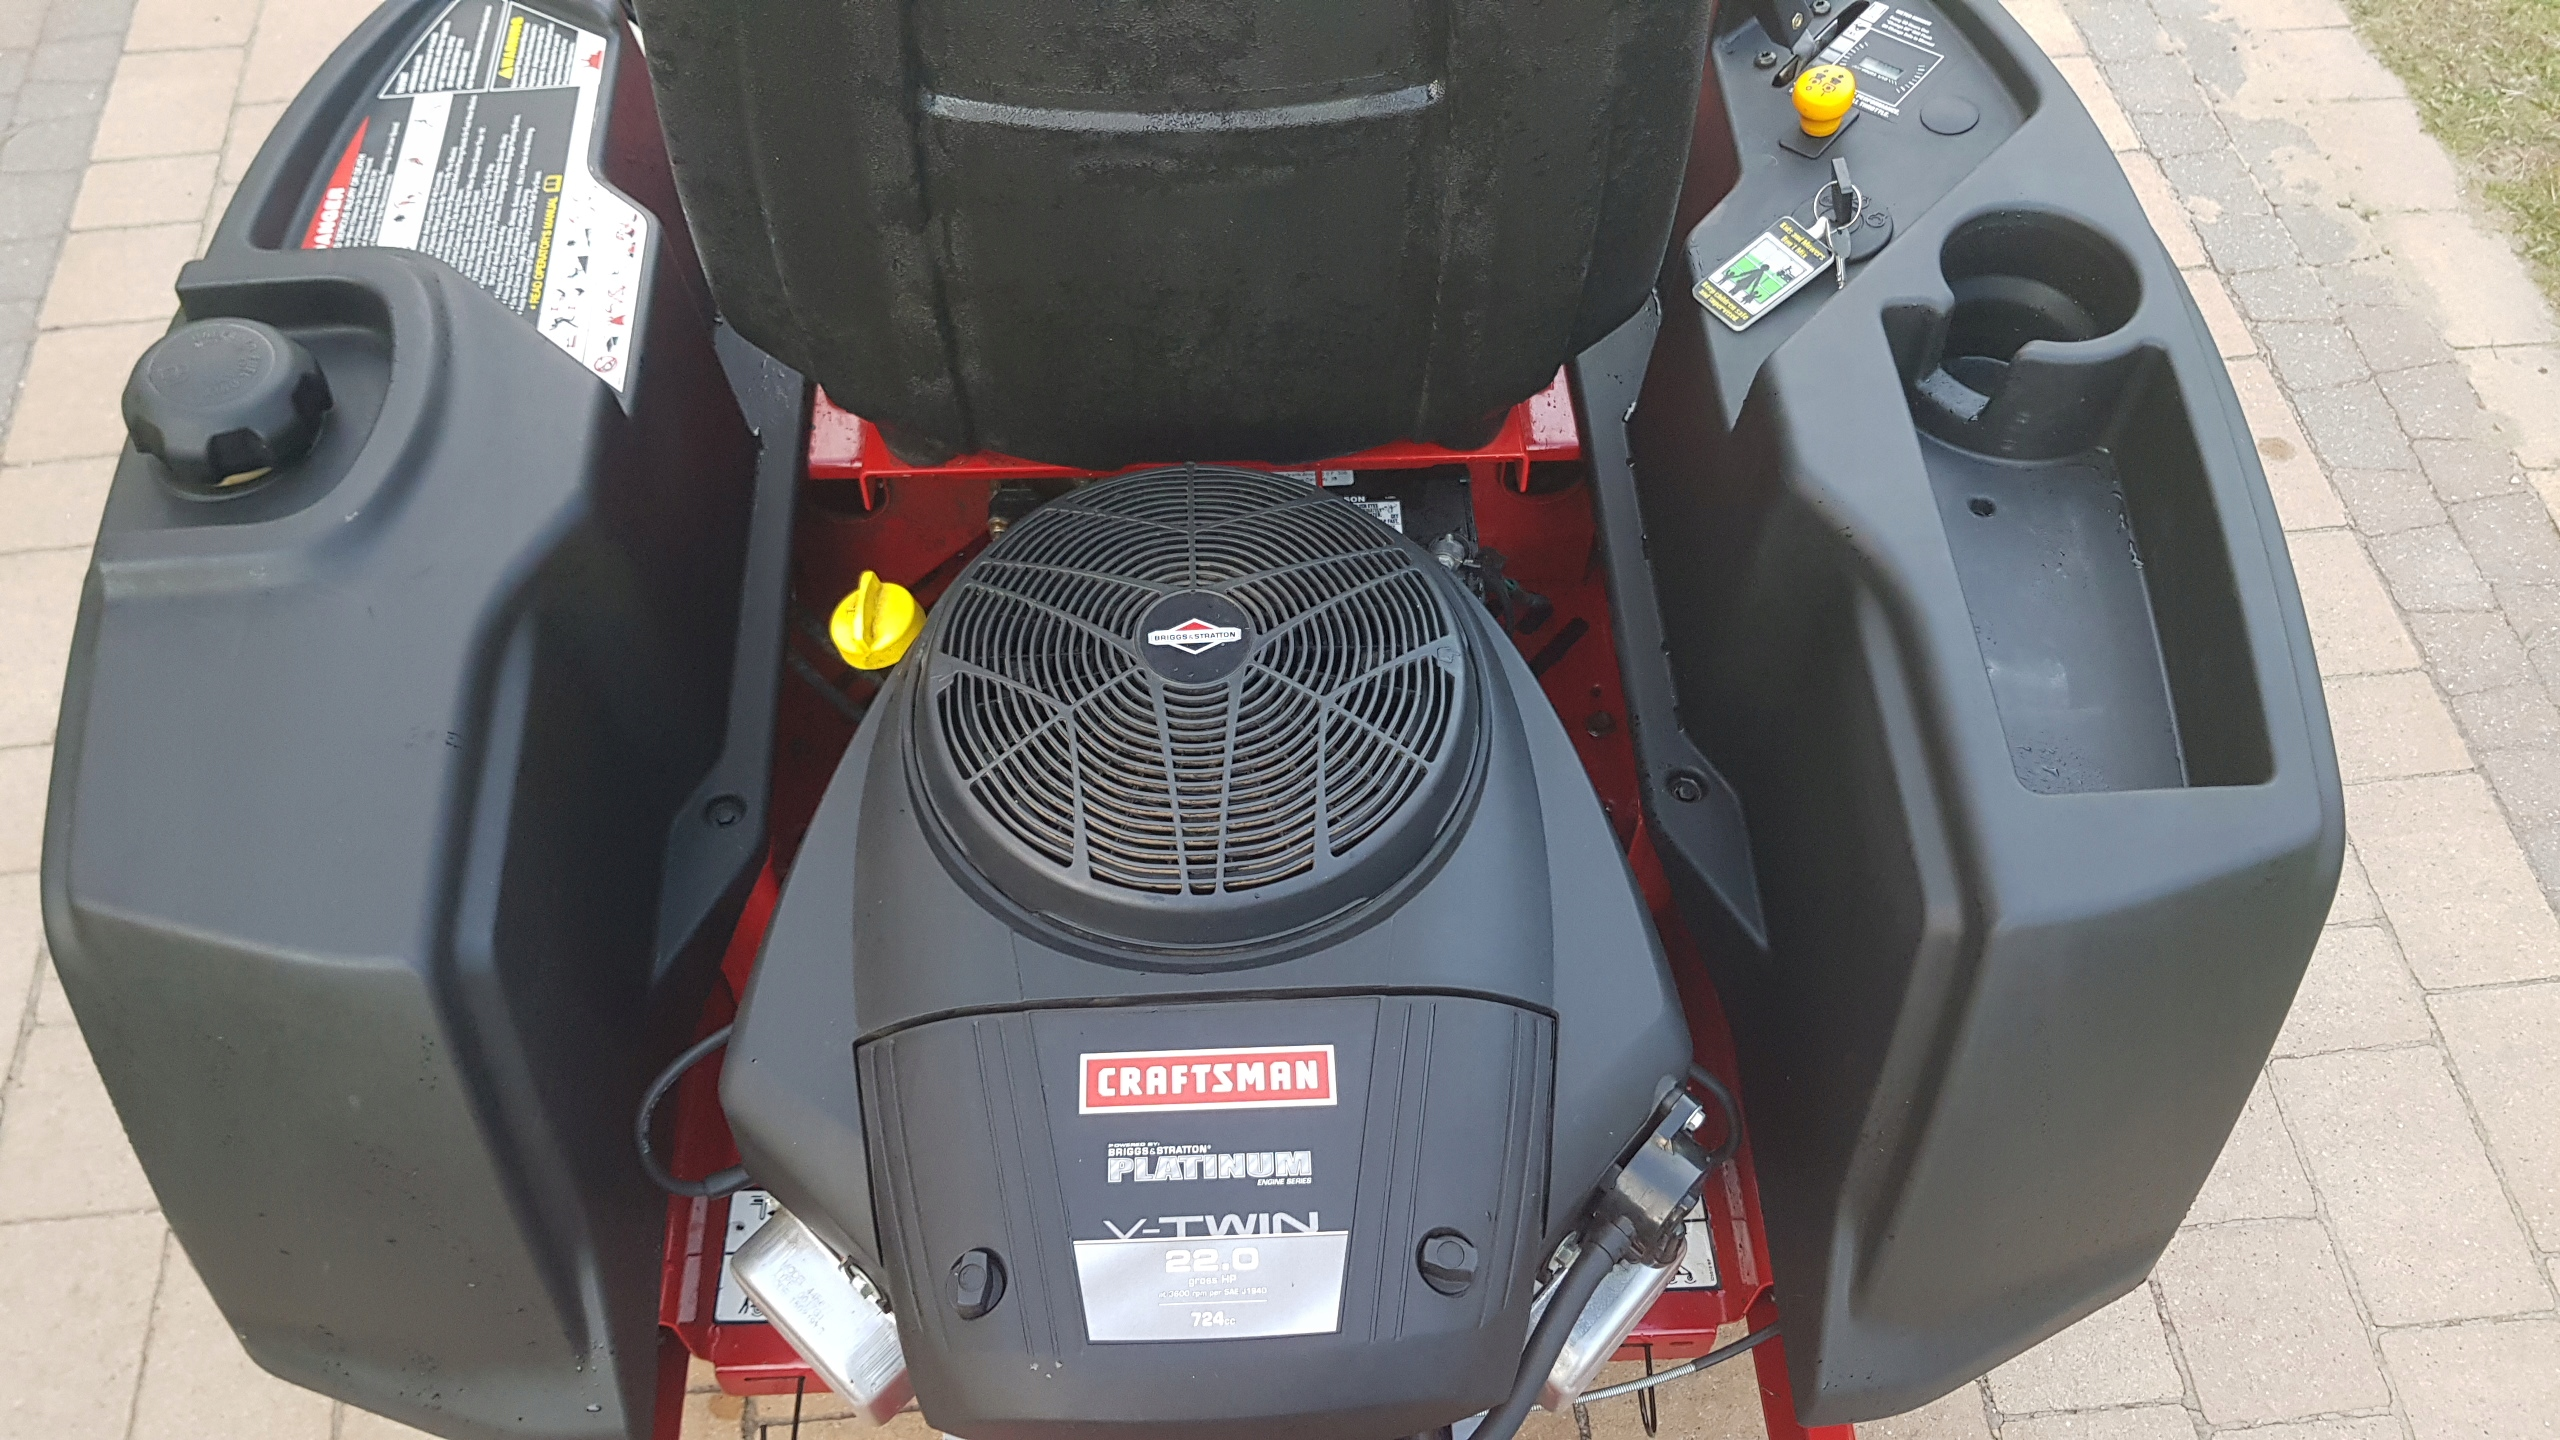 Craftsman Z6000 kosiarka ZERO TURN traktorek - 7705119088